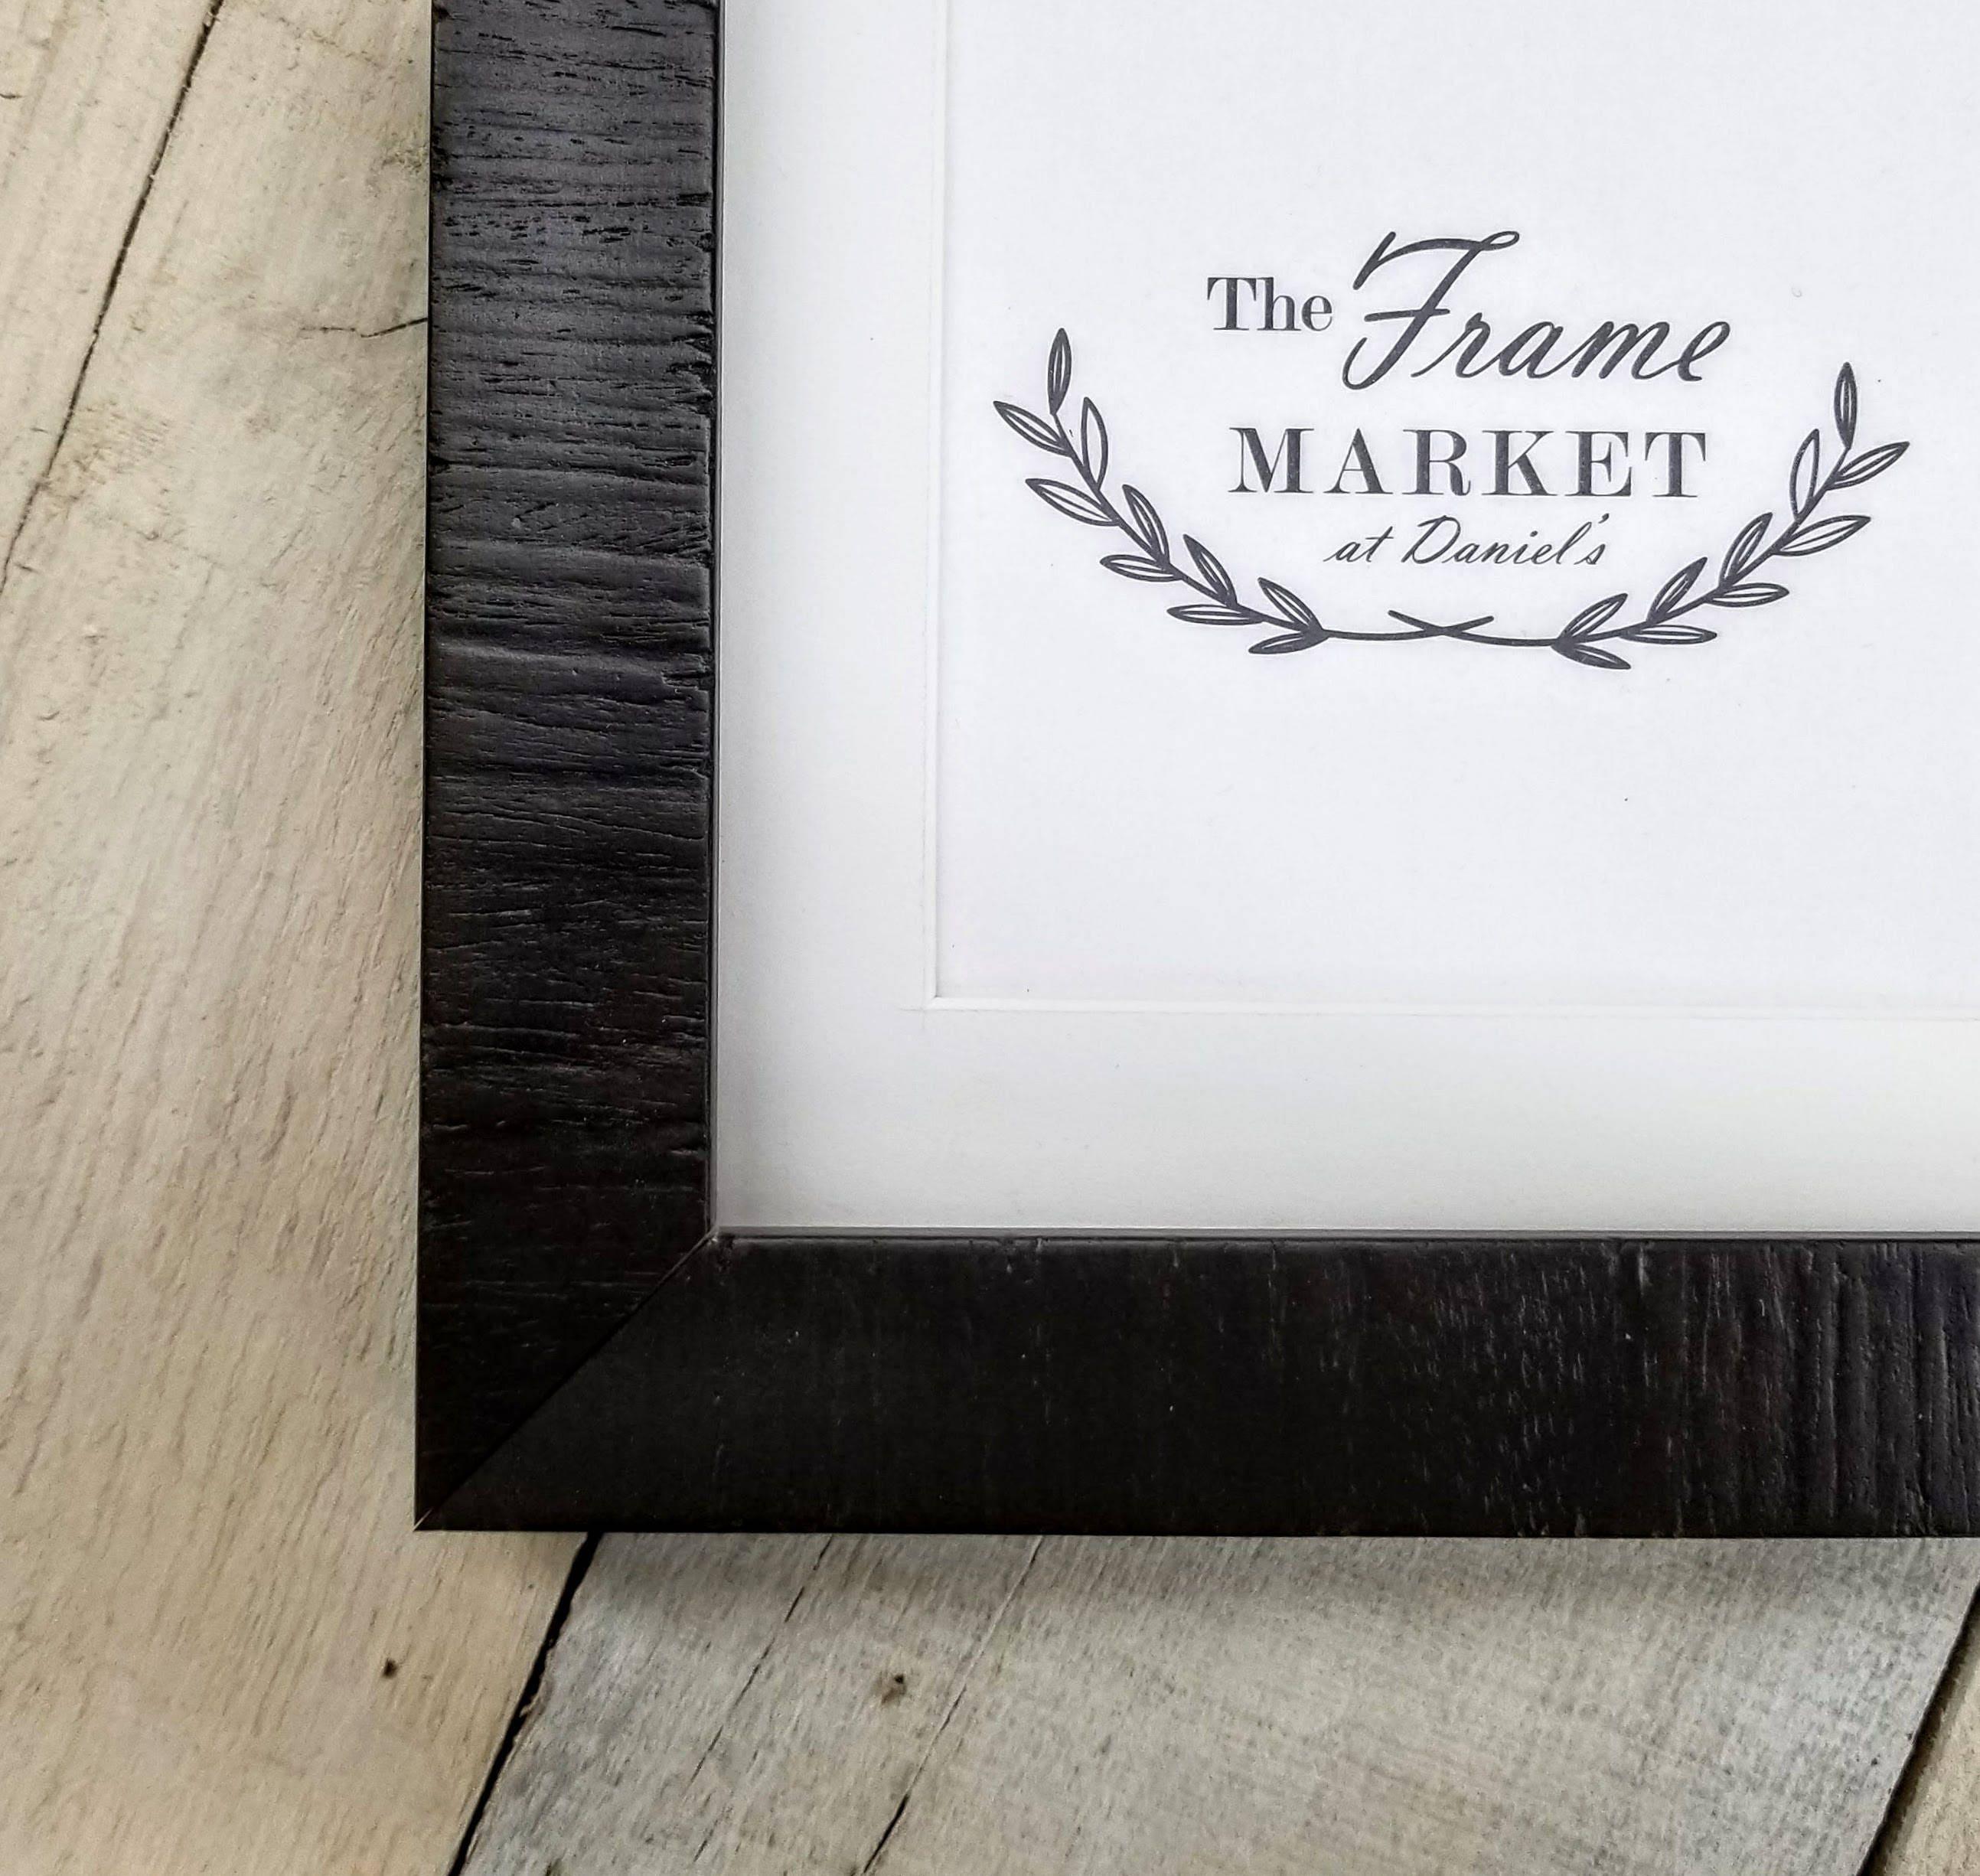 Lanais Ebony Walnut Wood Picture Frame With White Mat 8x10